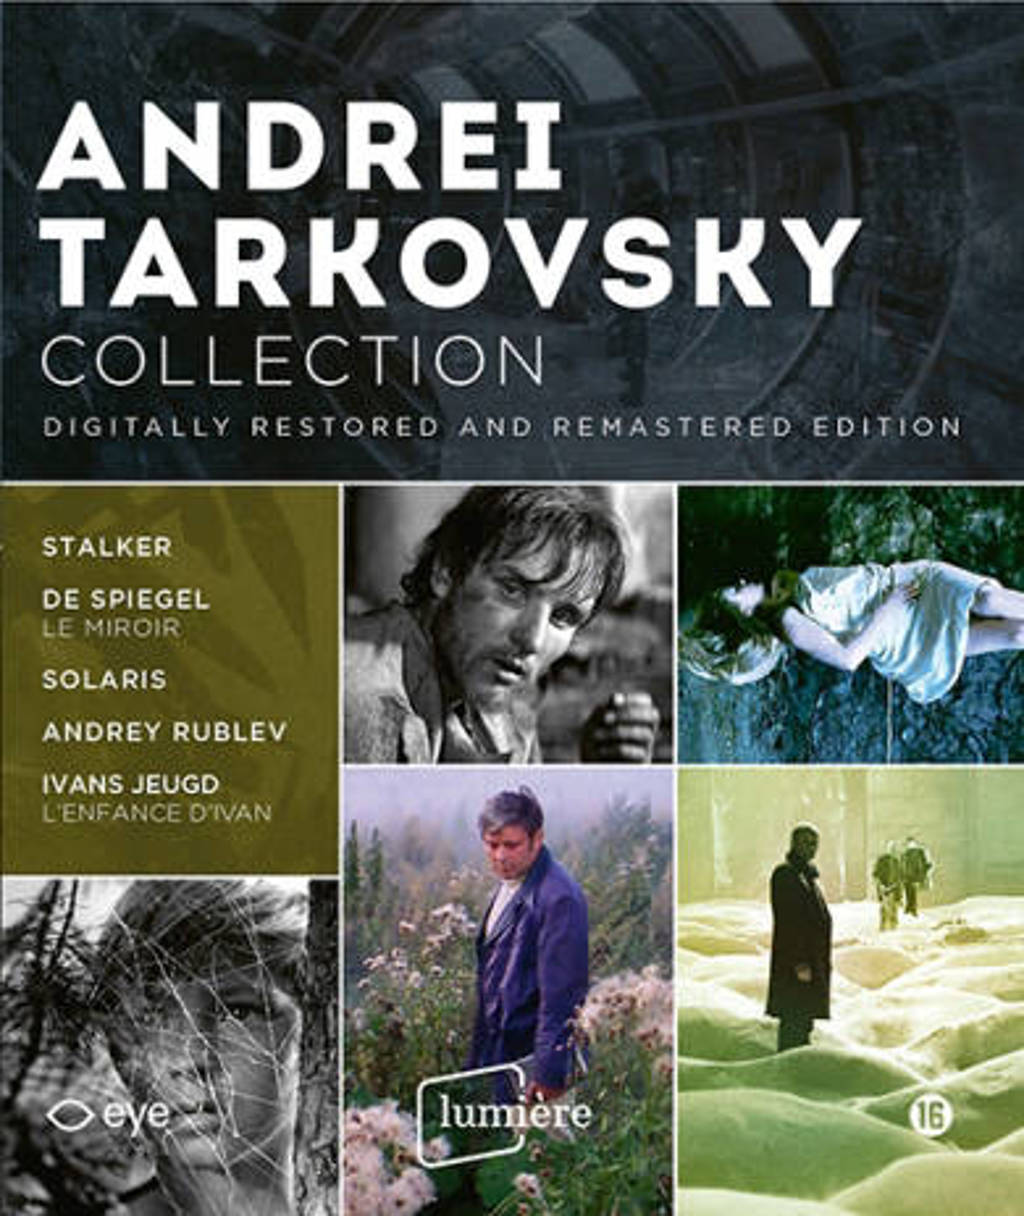 Tarkovsky collection - Remastered (Blu-ray)